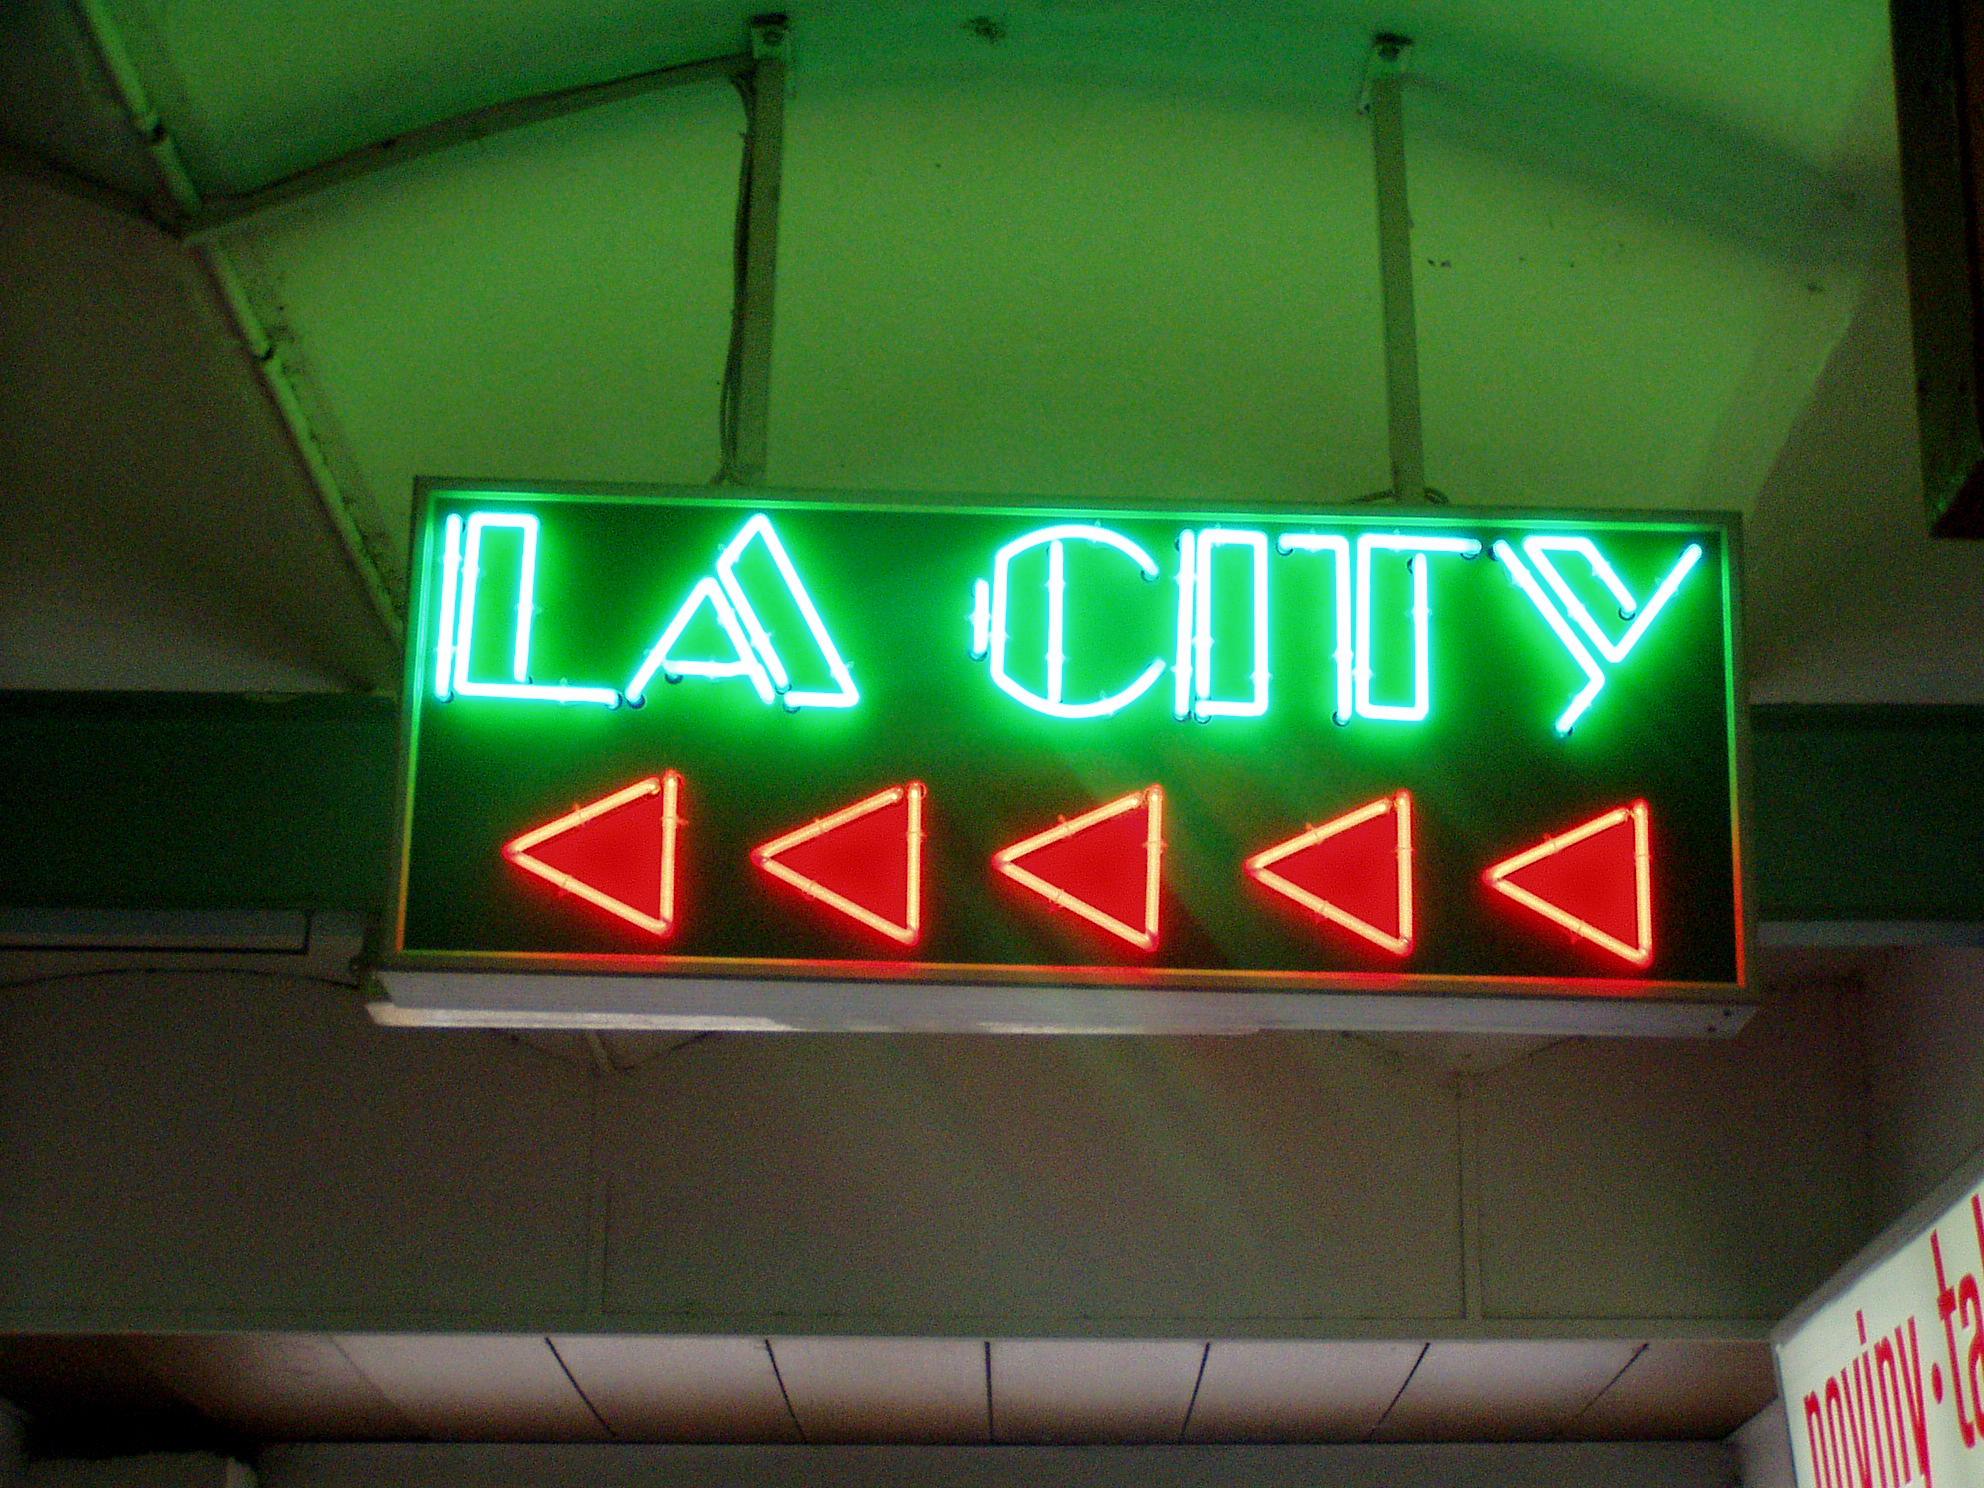 LACITY